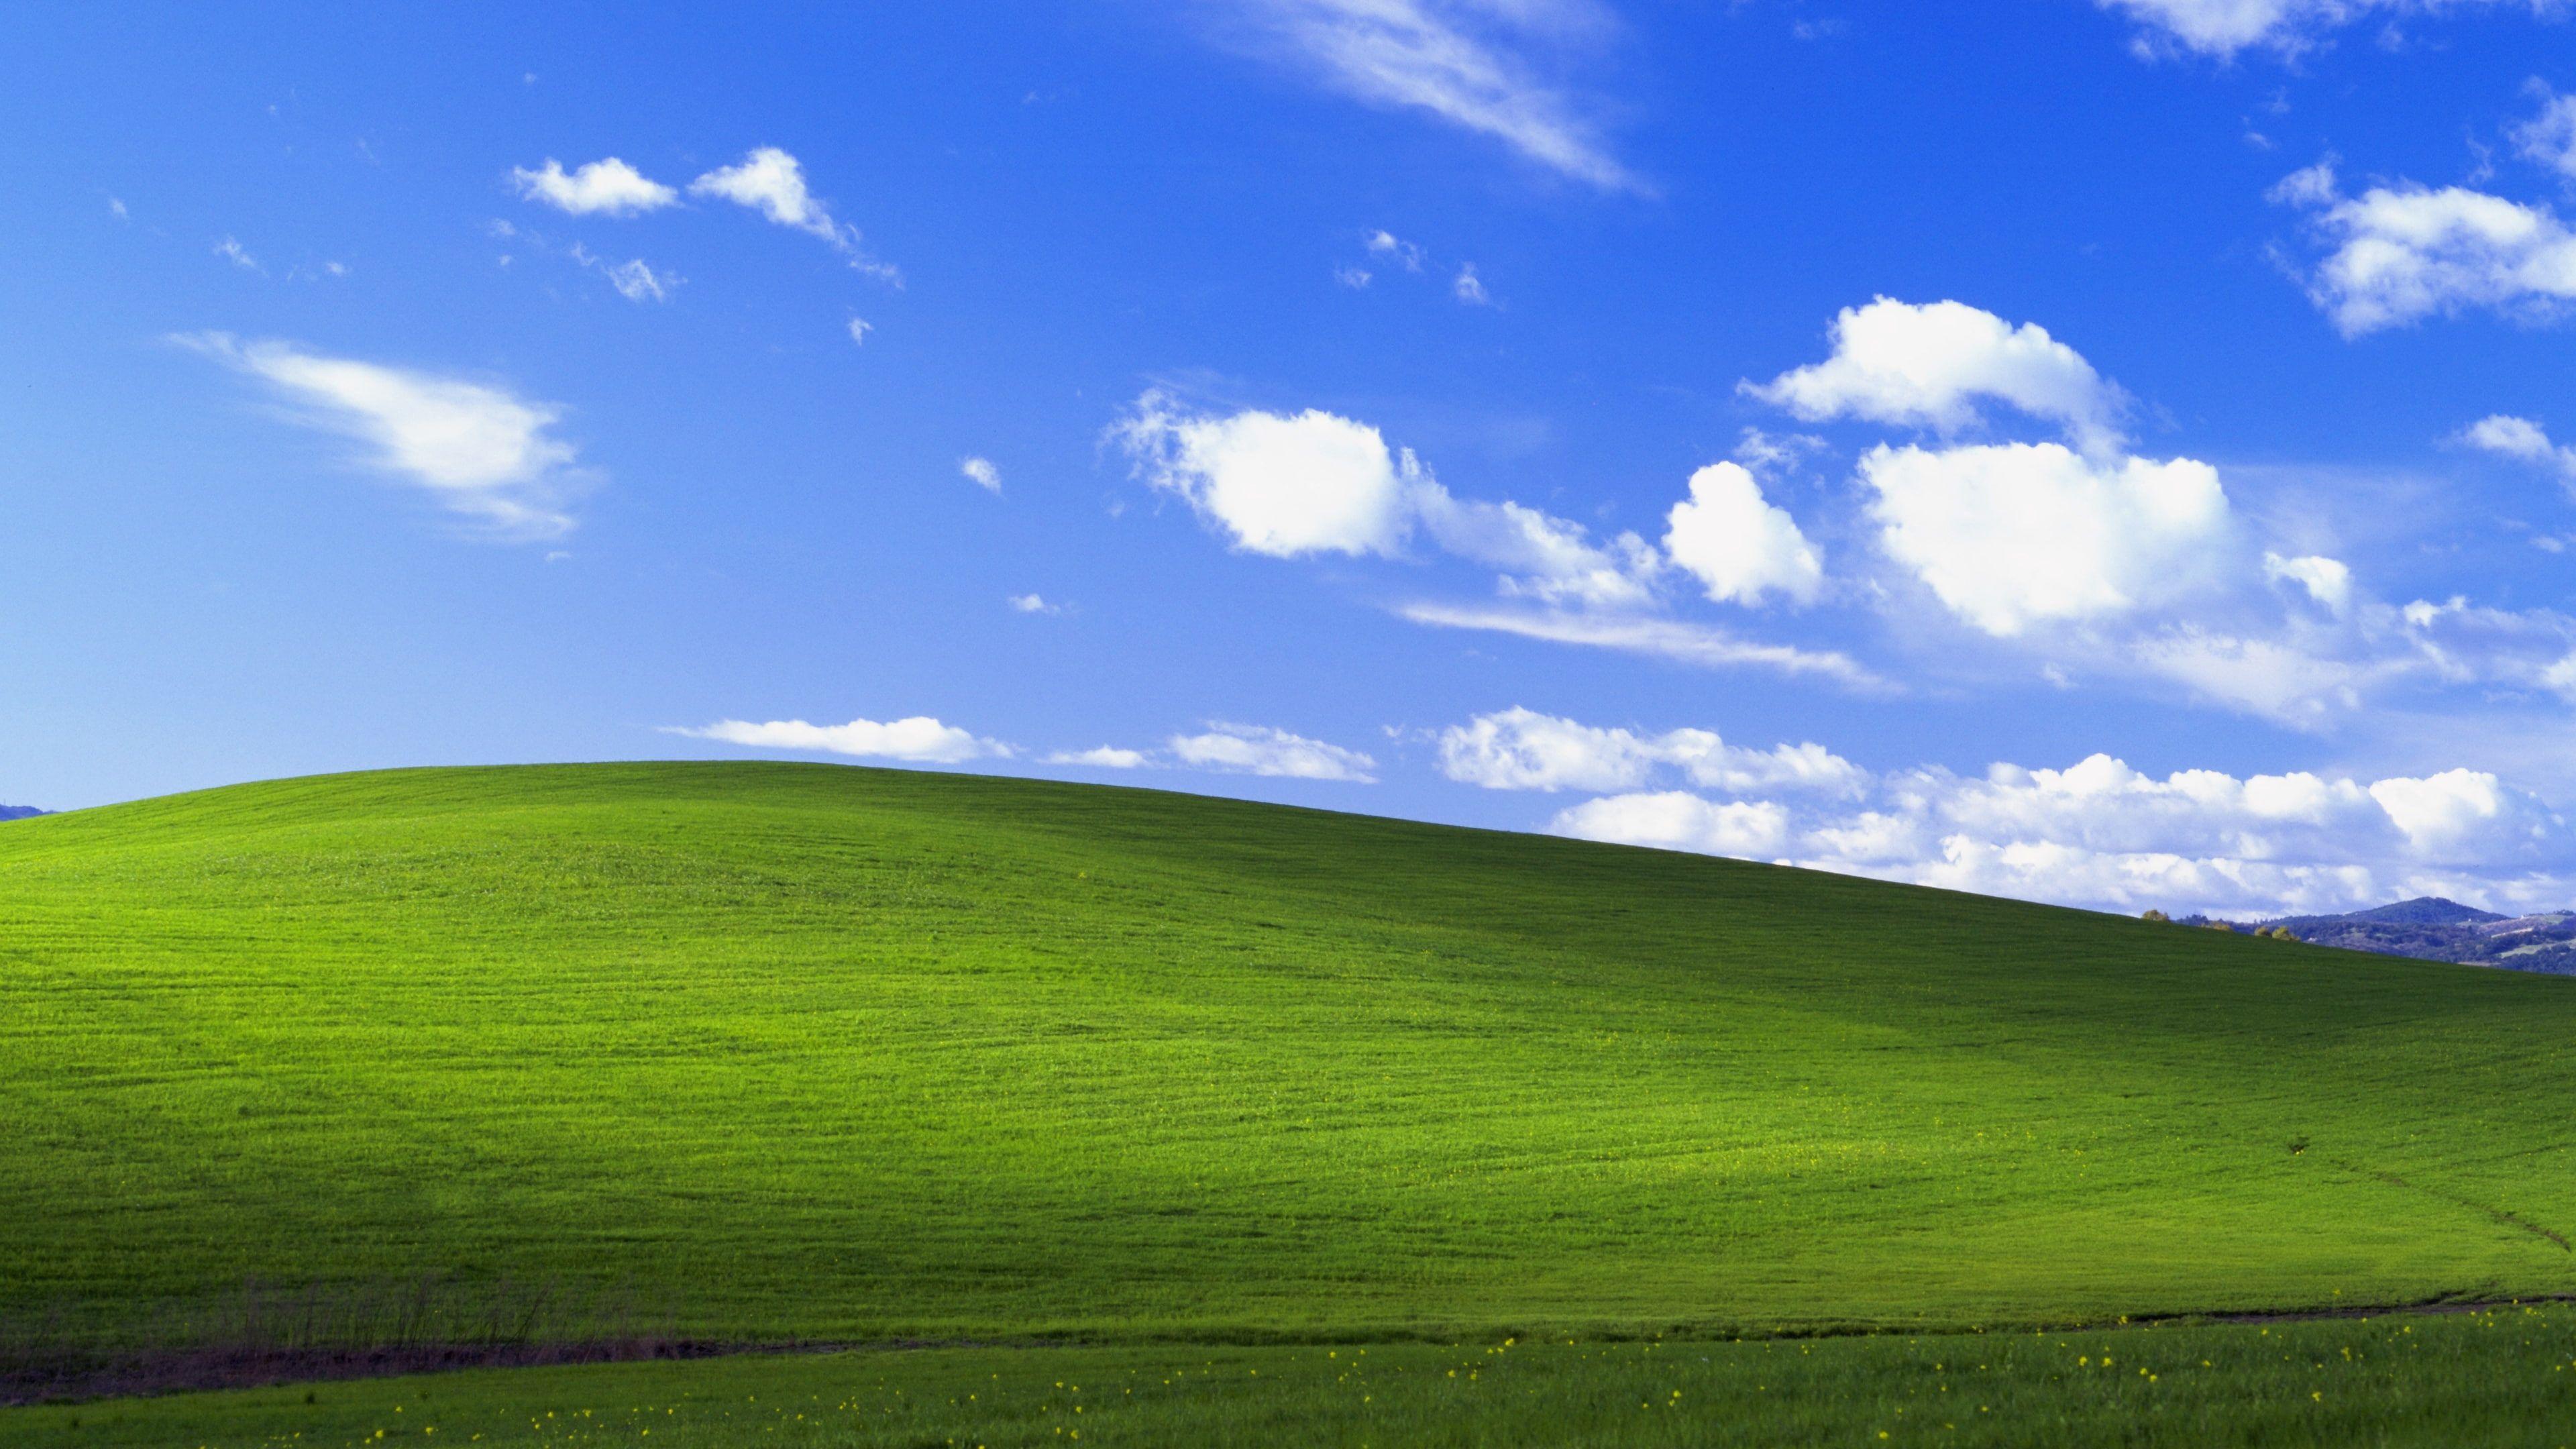 Landscape 4k Bliss Windows Xp Stock 4k Wallpaper Hdwallpaper Desktop In 2020 Windows Wallpaper Windows Xp Backgrounds Desktop